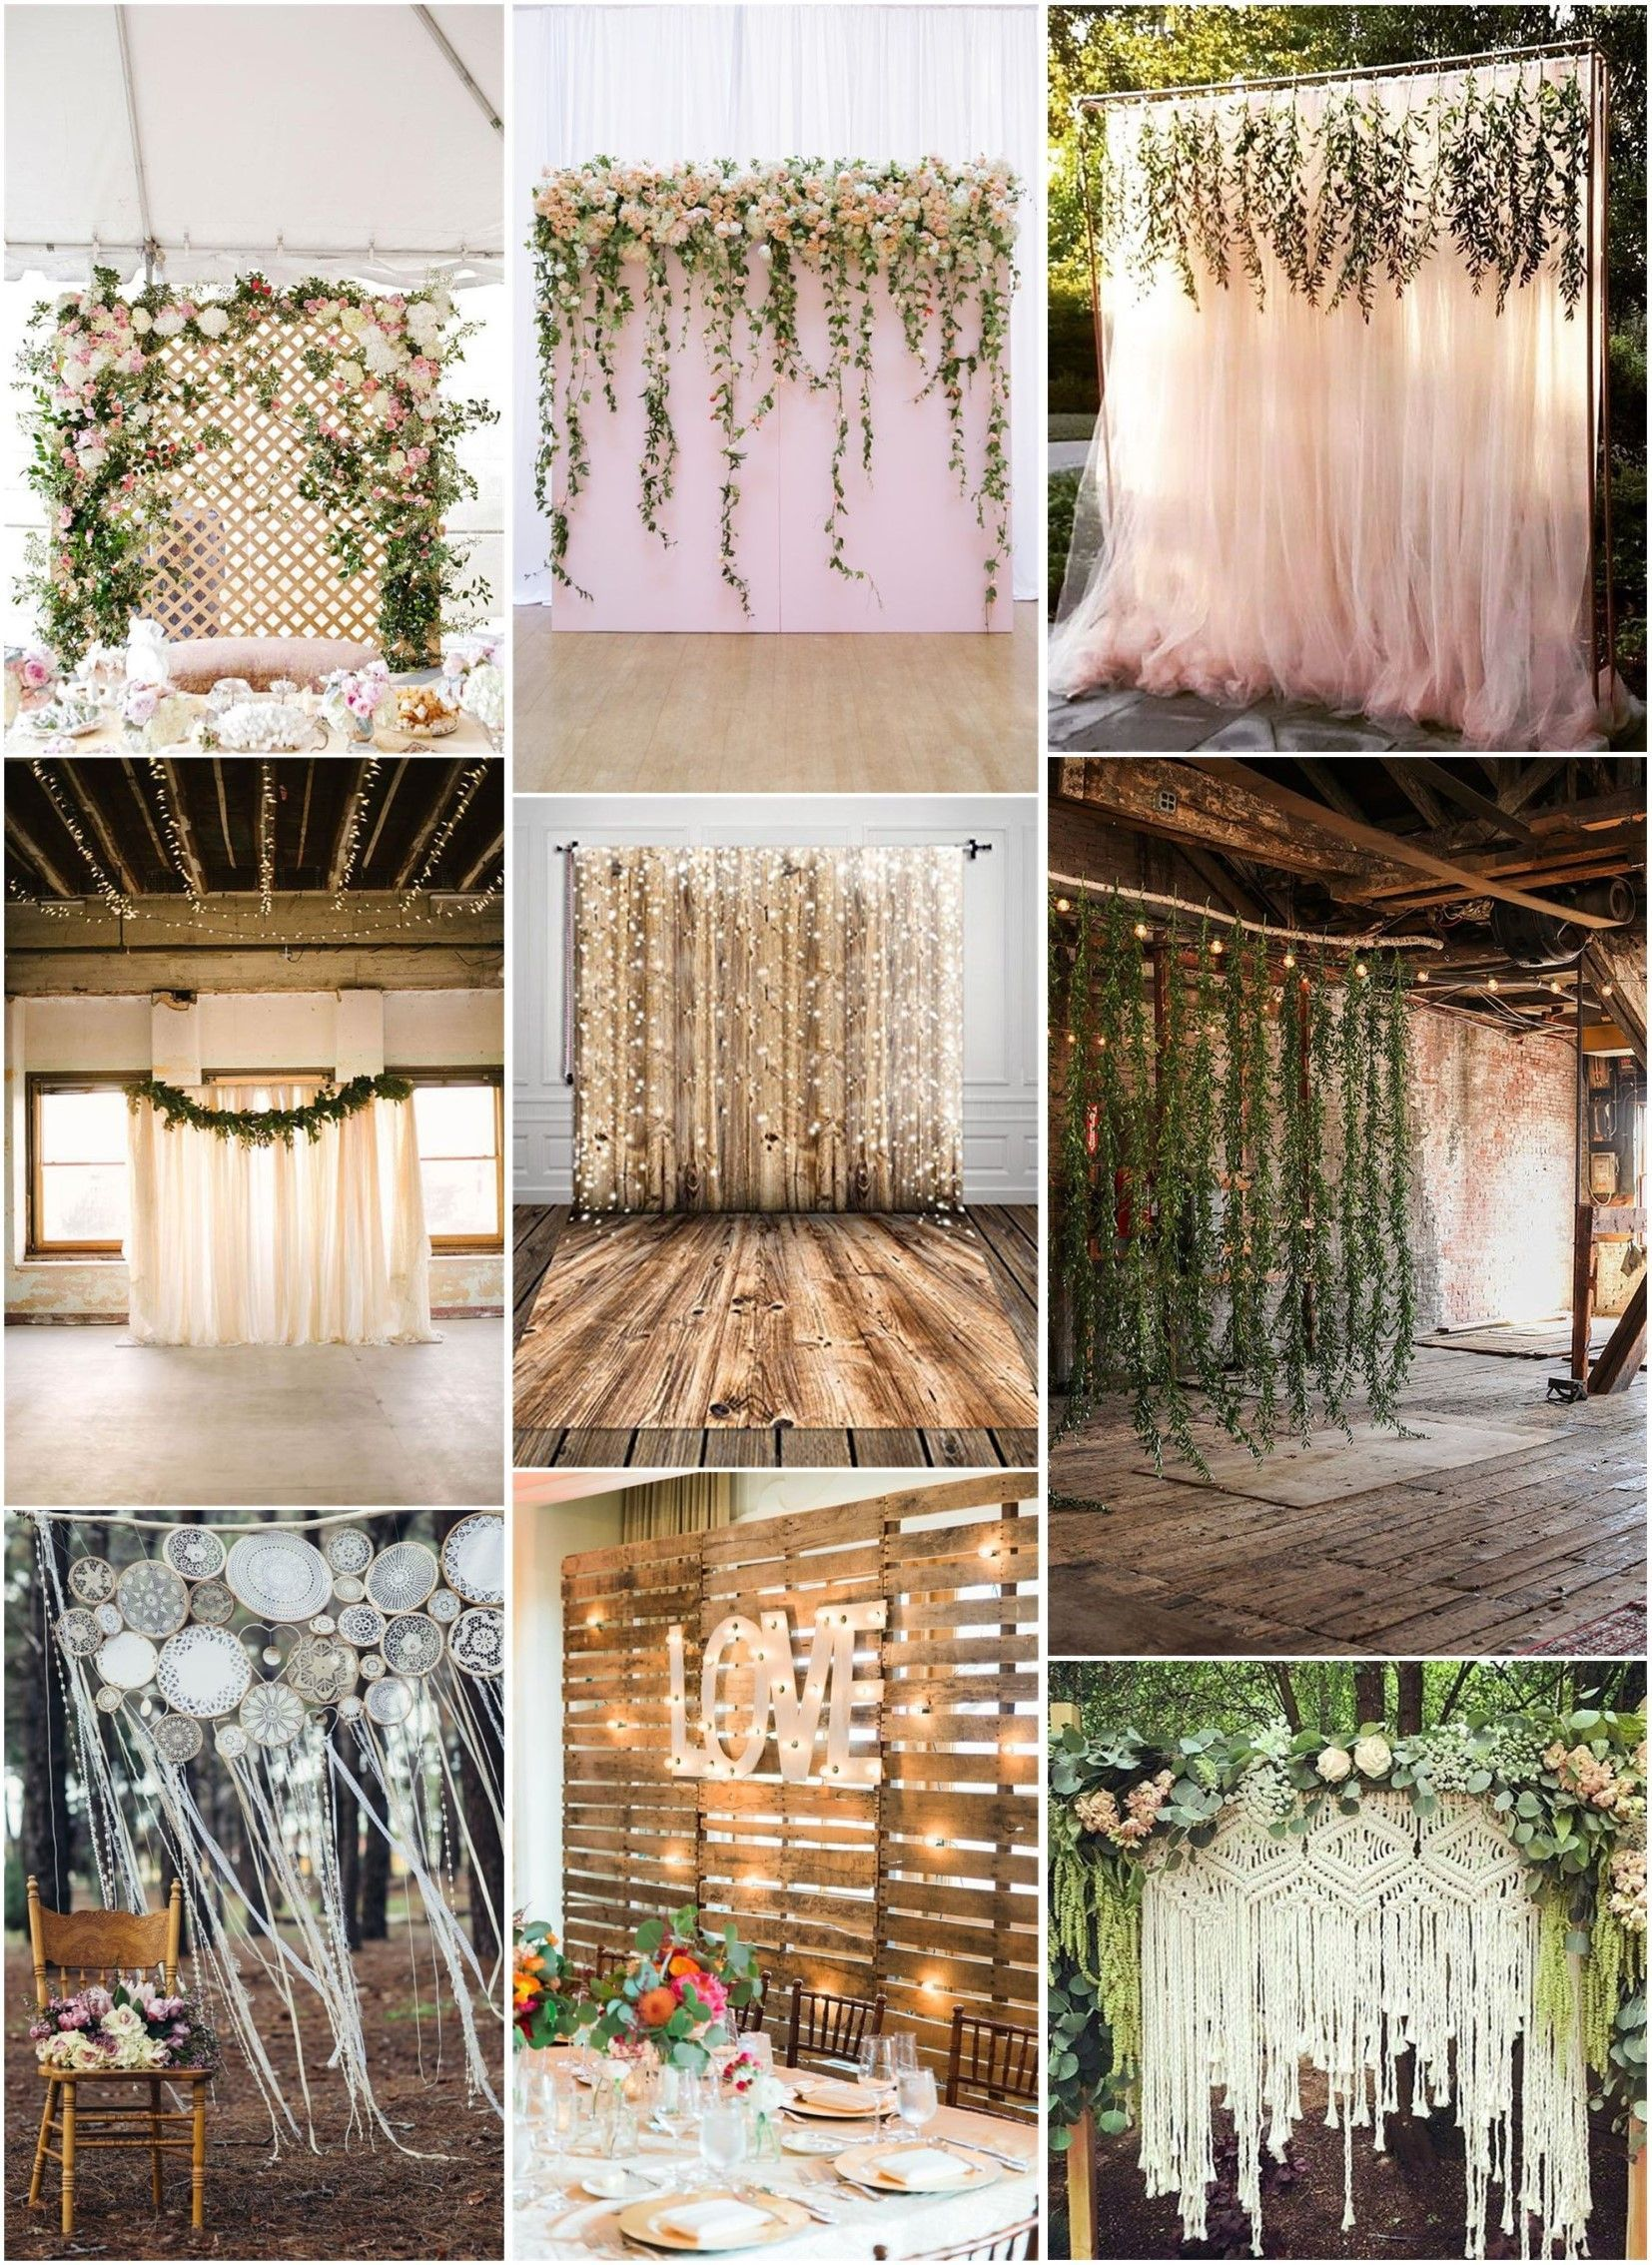 30 Unique And Breathtaking Wedding Backdrop Ideas Weddinginclude Diy Wedding Backdrop Wedding Themes Rustic Bridal Shower Backdrop